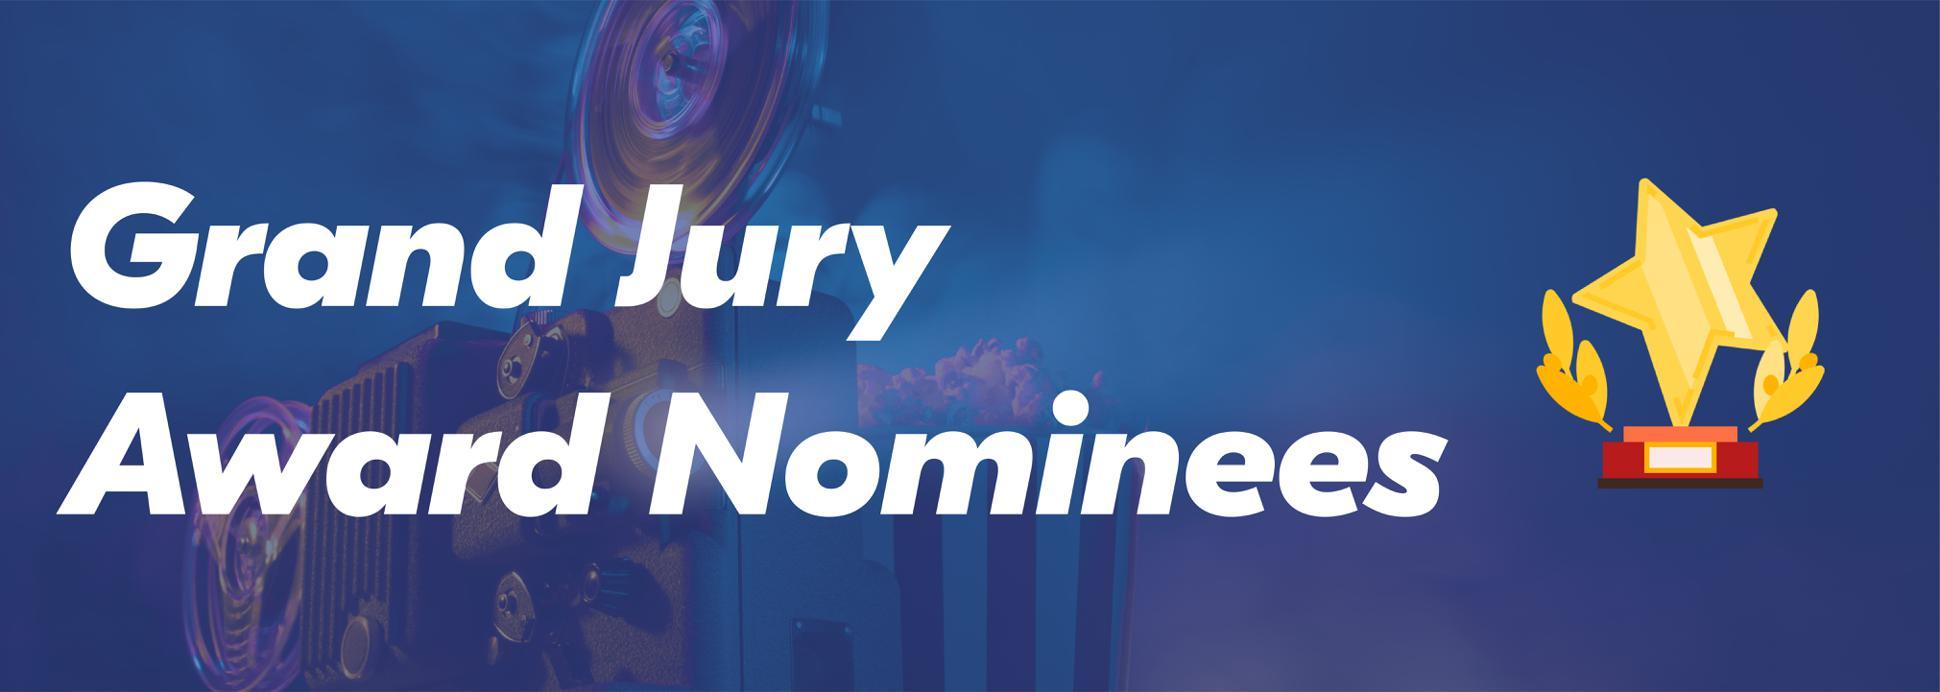 Grand Jury Award Nominees